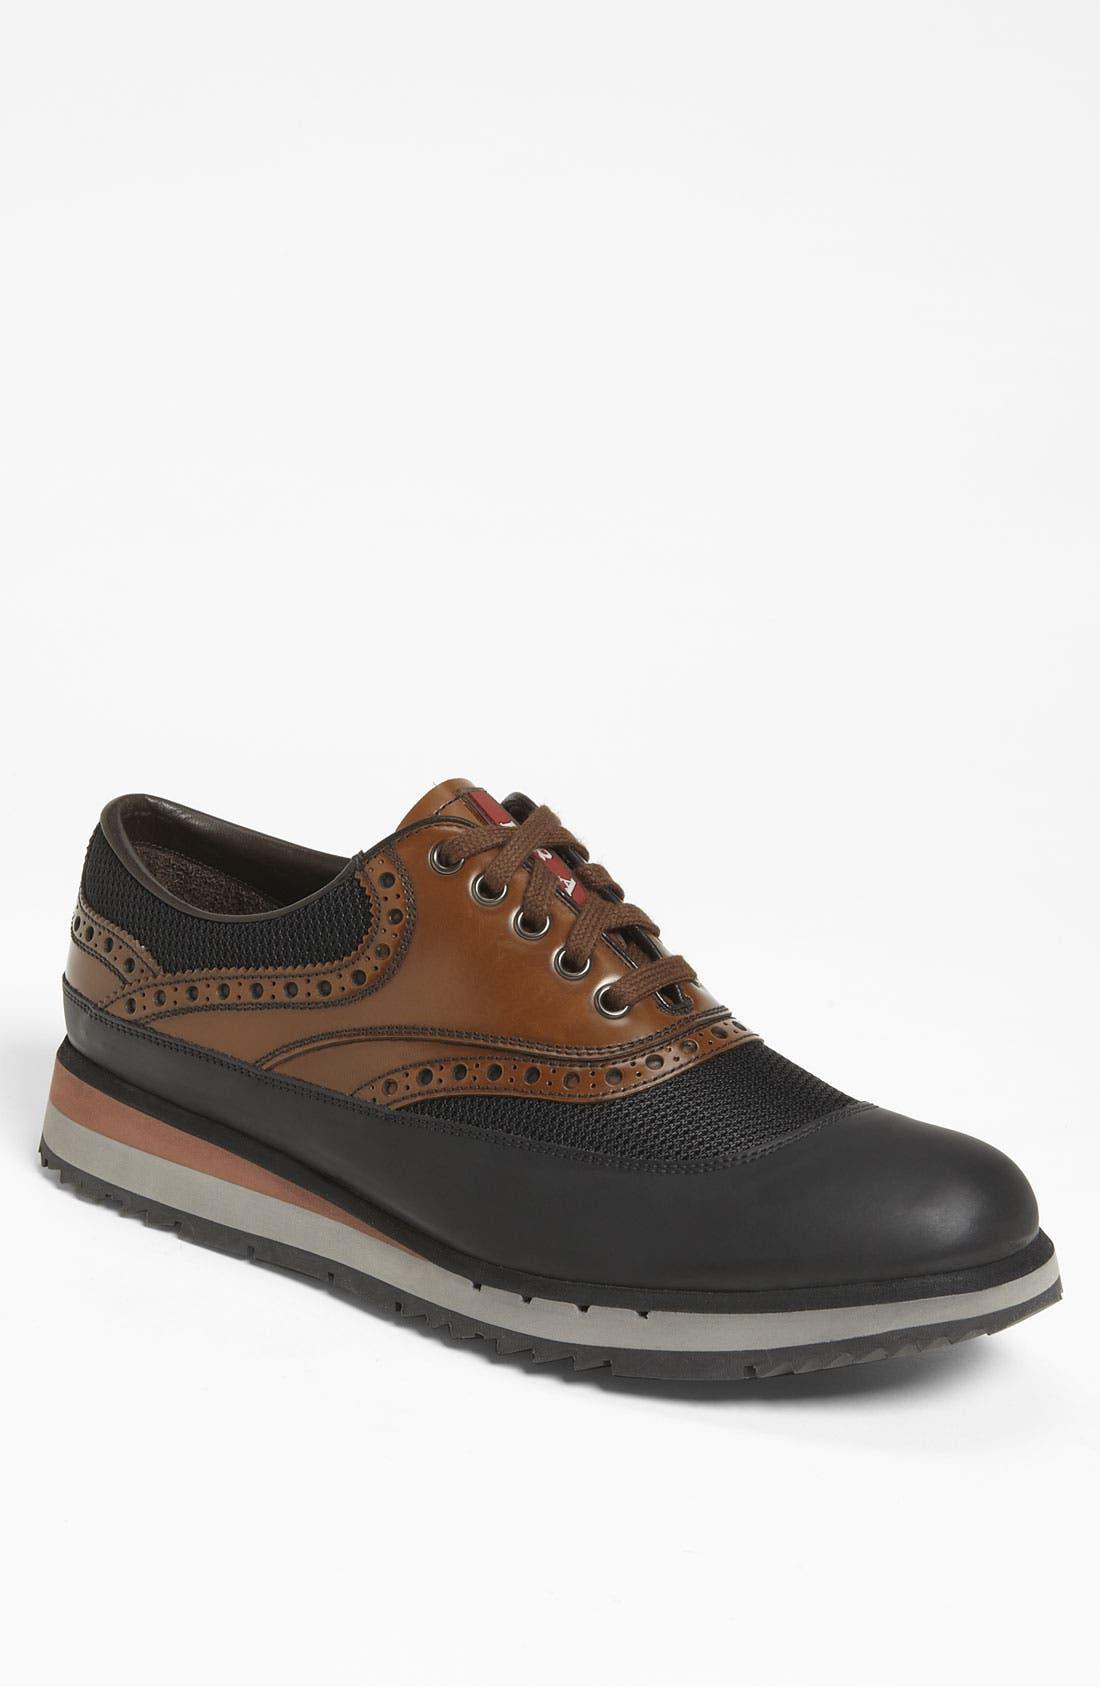 Alternate Image 1 Selected - Prada Double Sole Brogue Sneaker